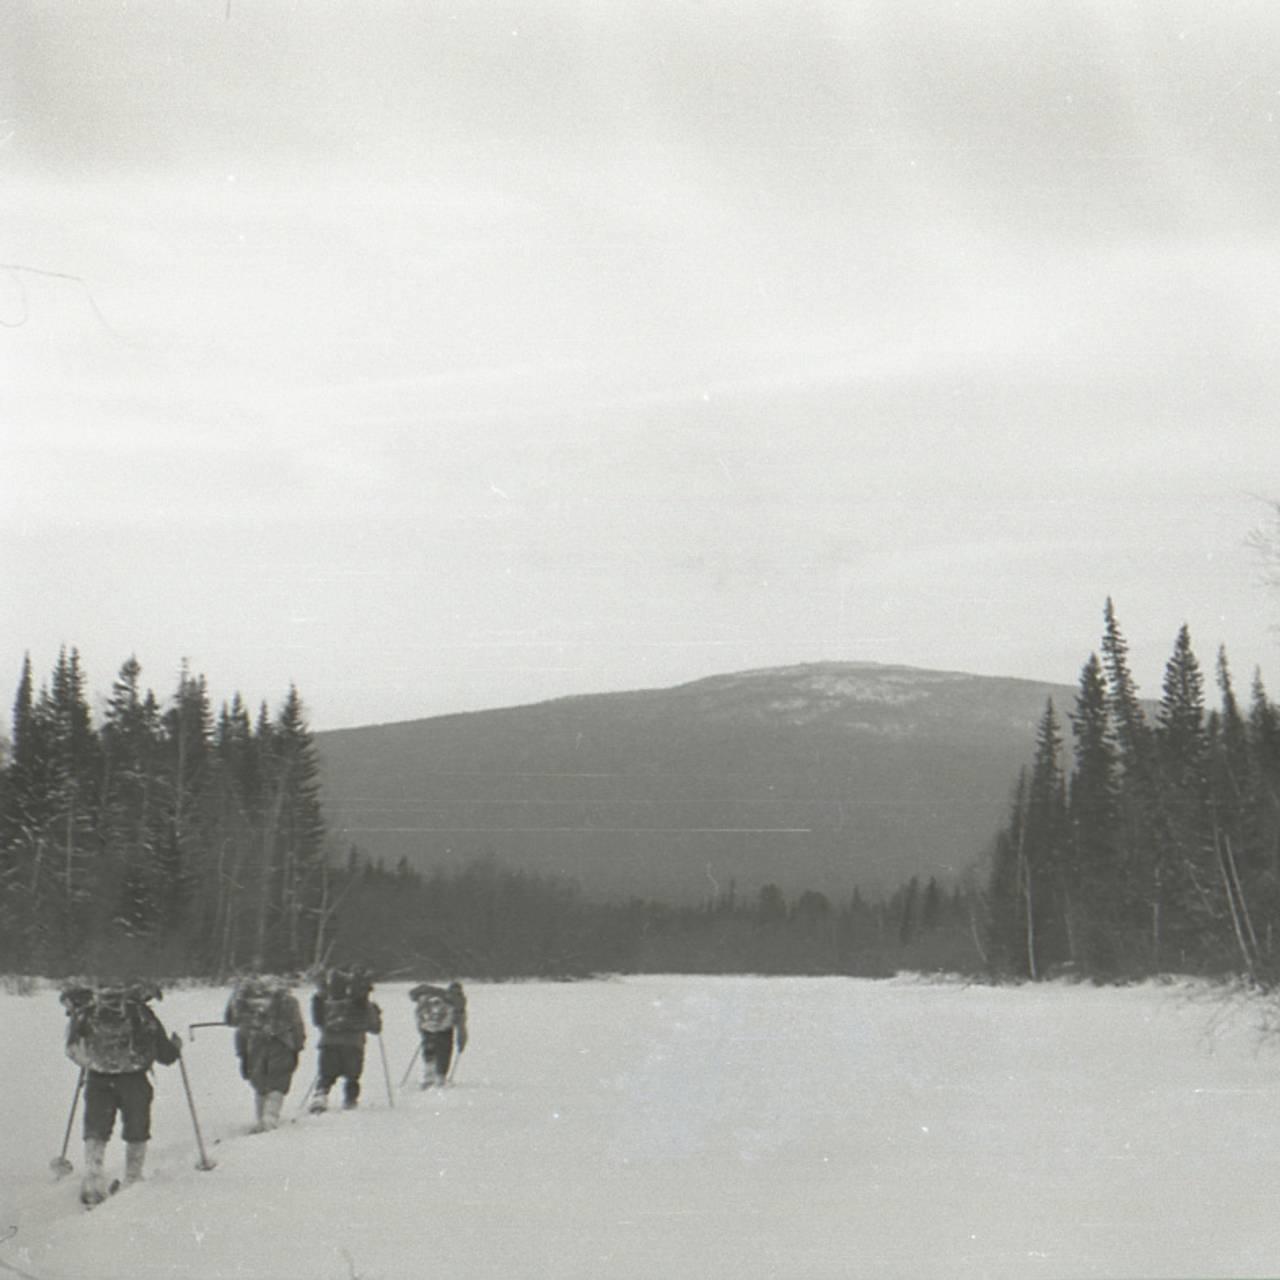 Gruppa går på ski